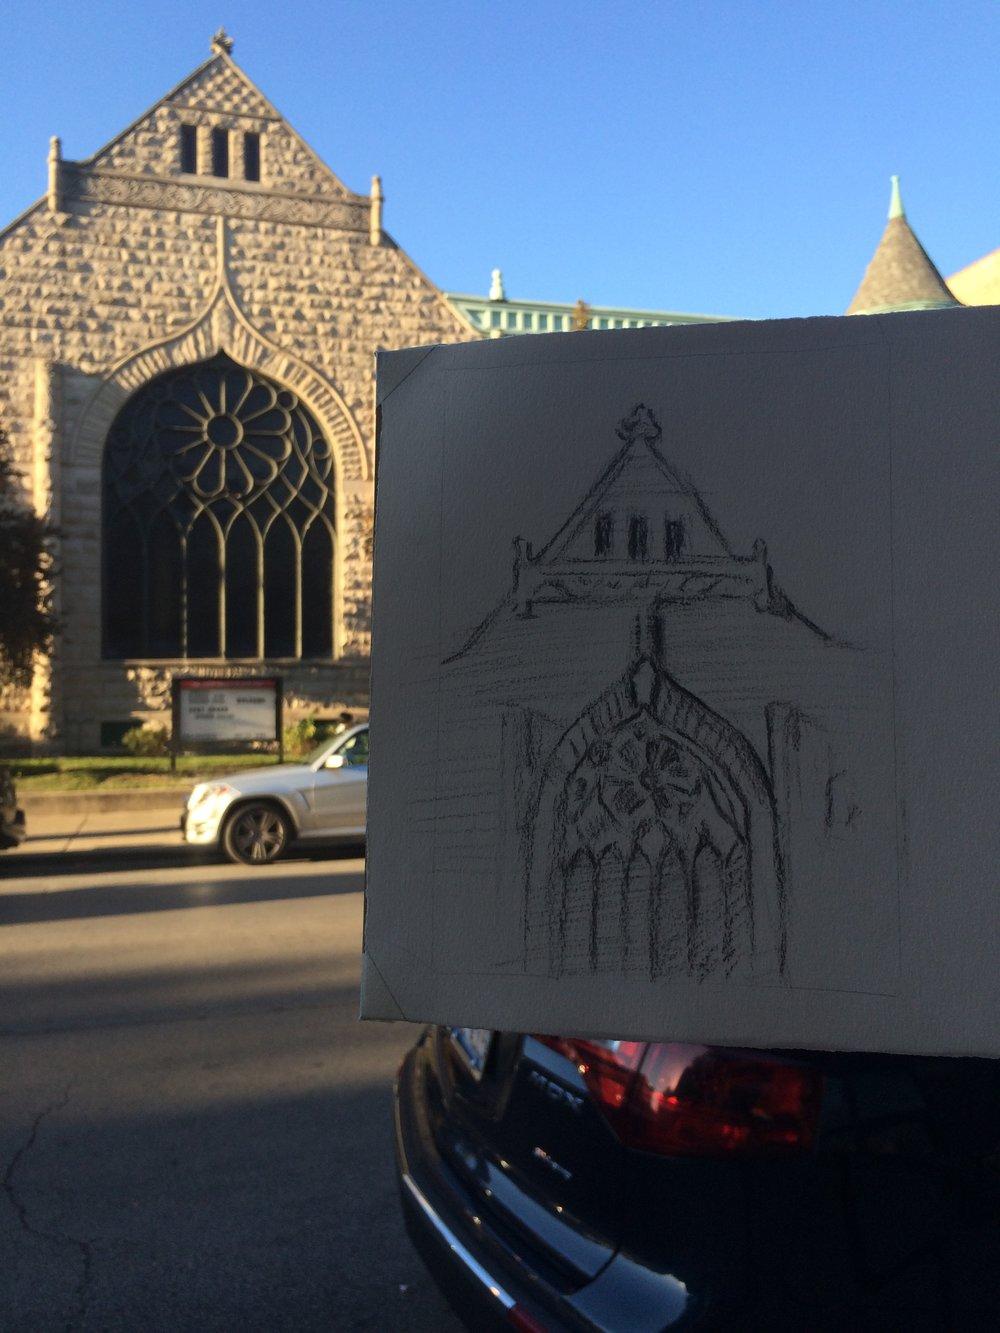 Day 20. A church window.